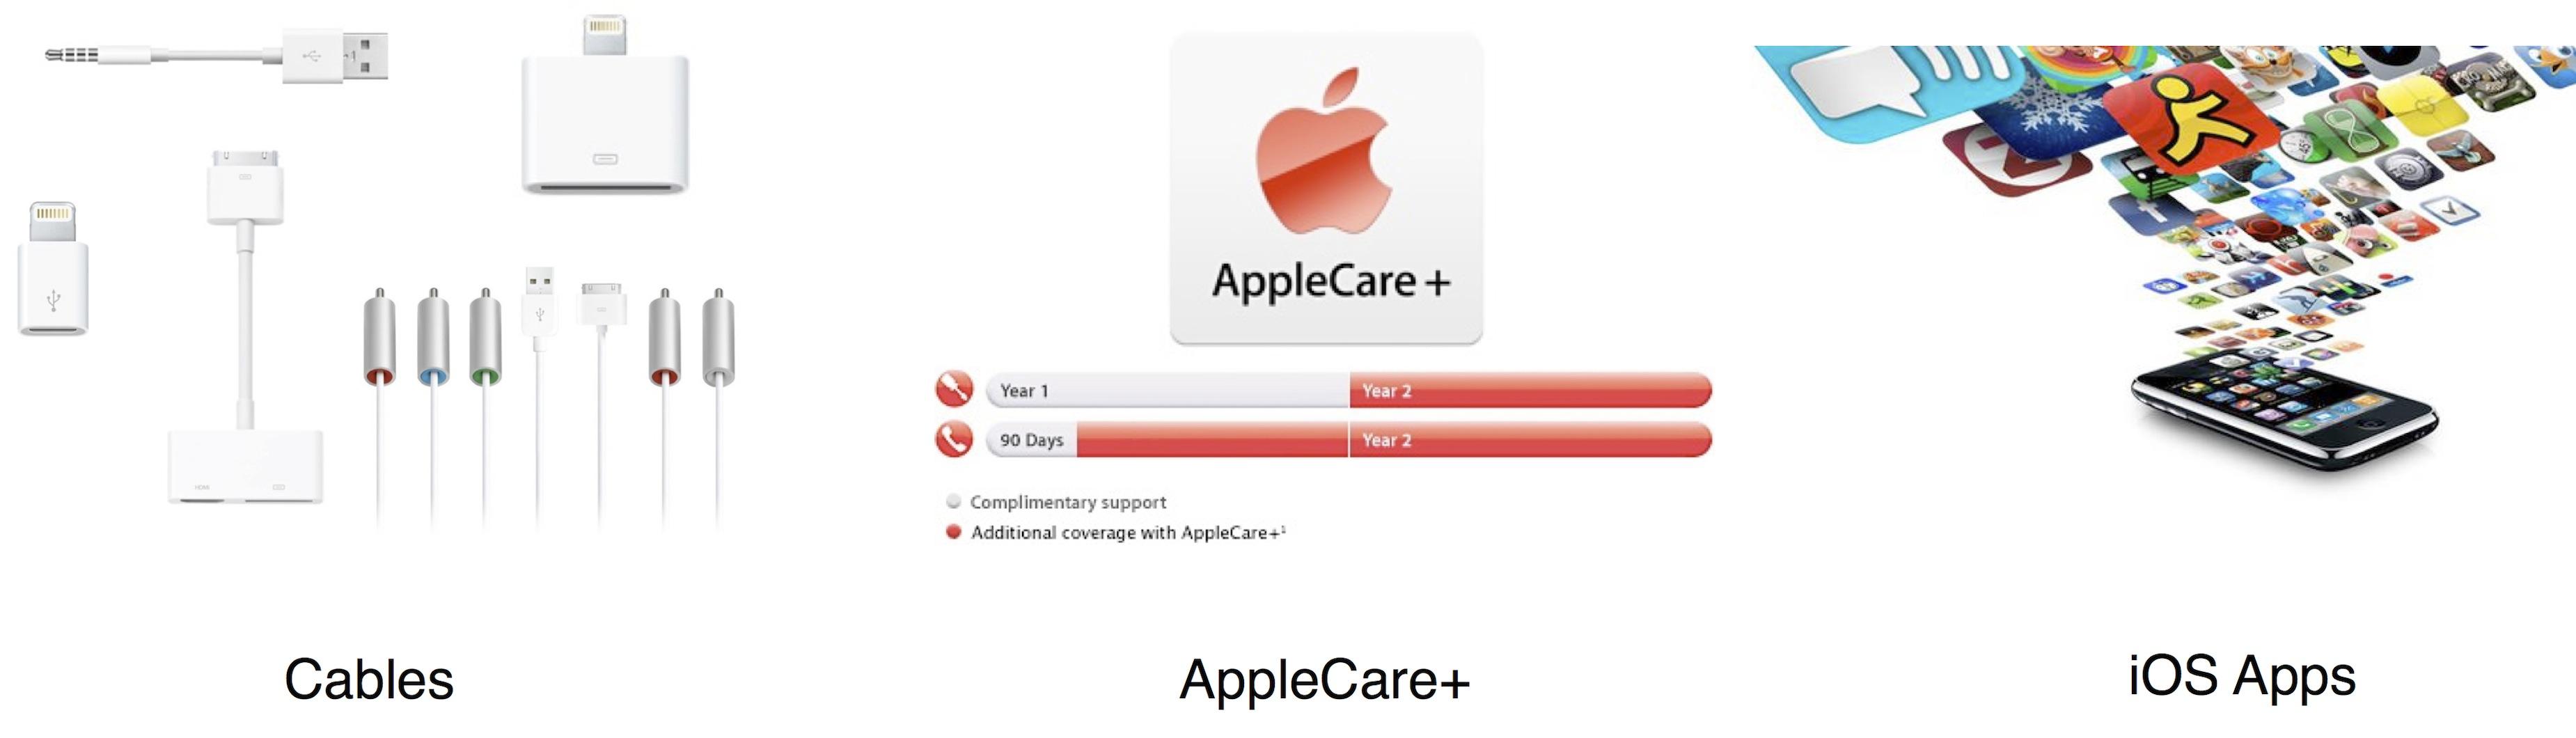 Apple Ecosystem